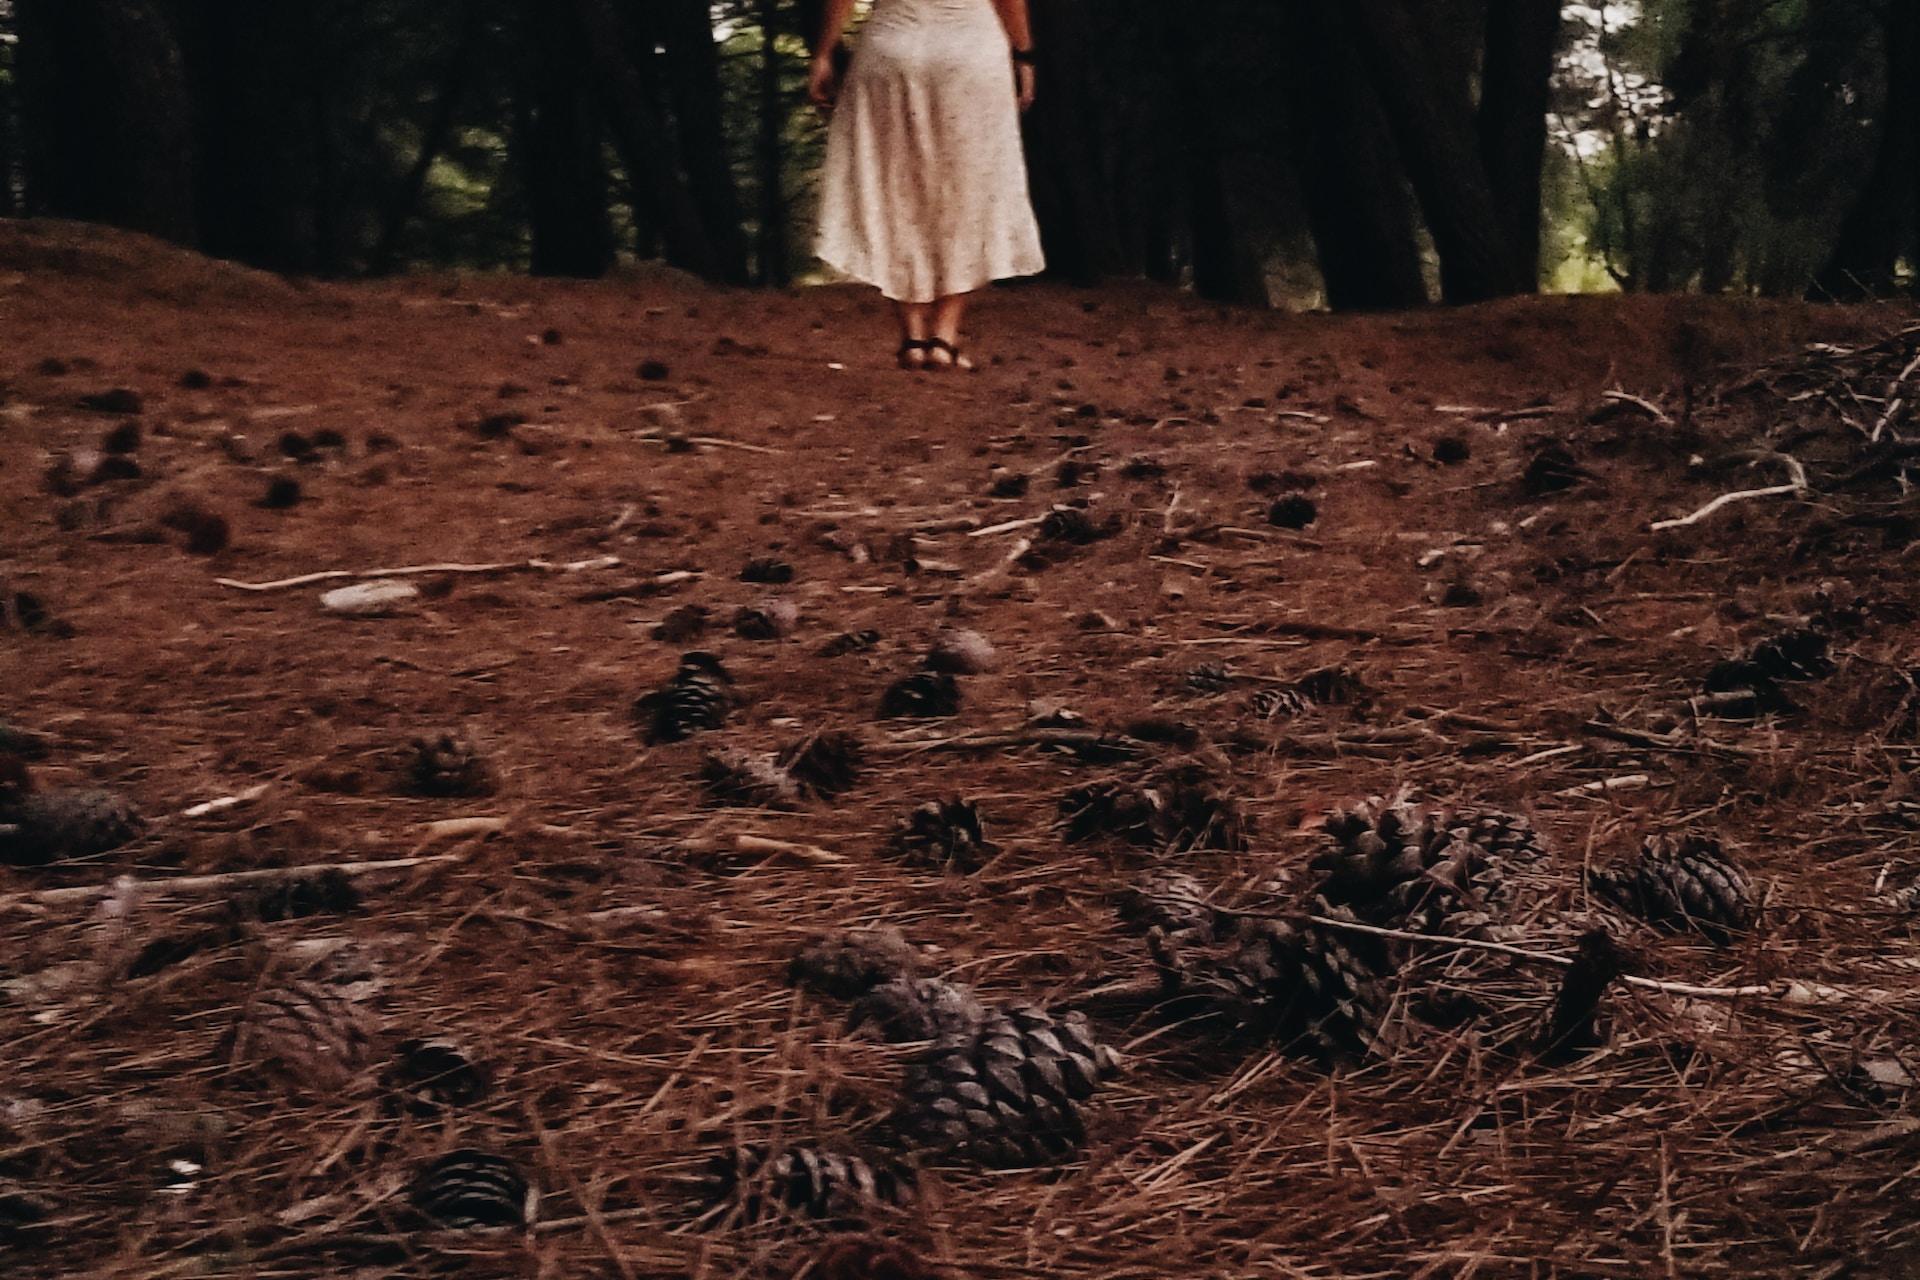 woman wearing white standing on brown soil